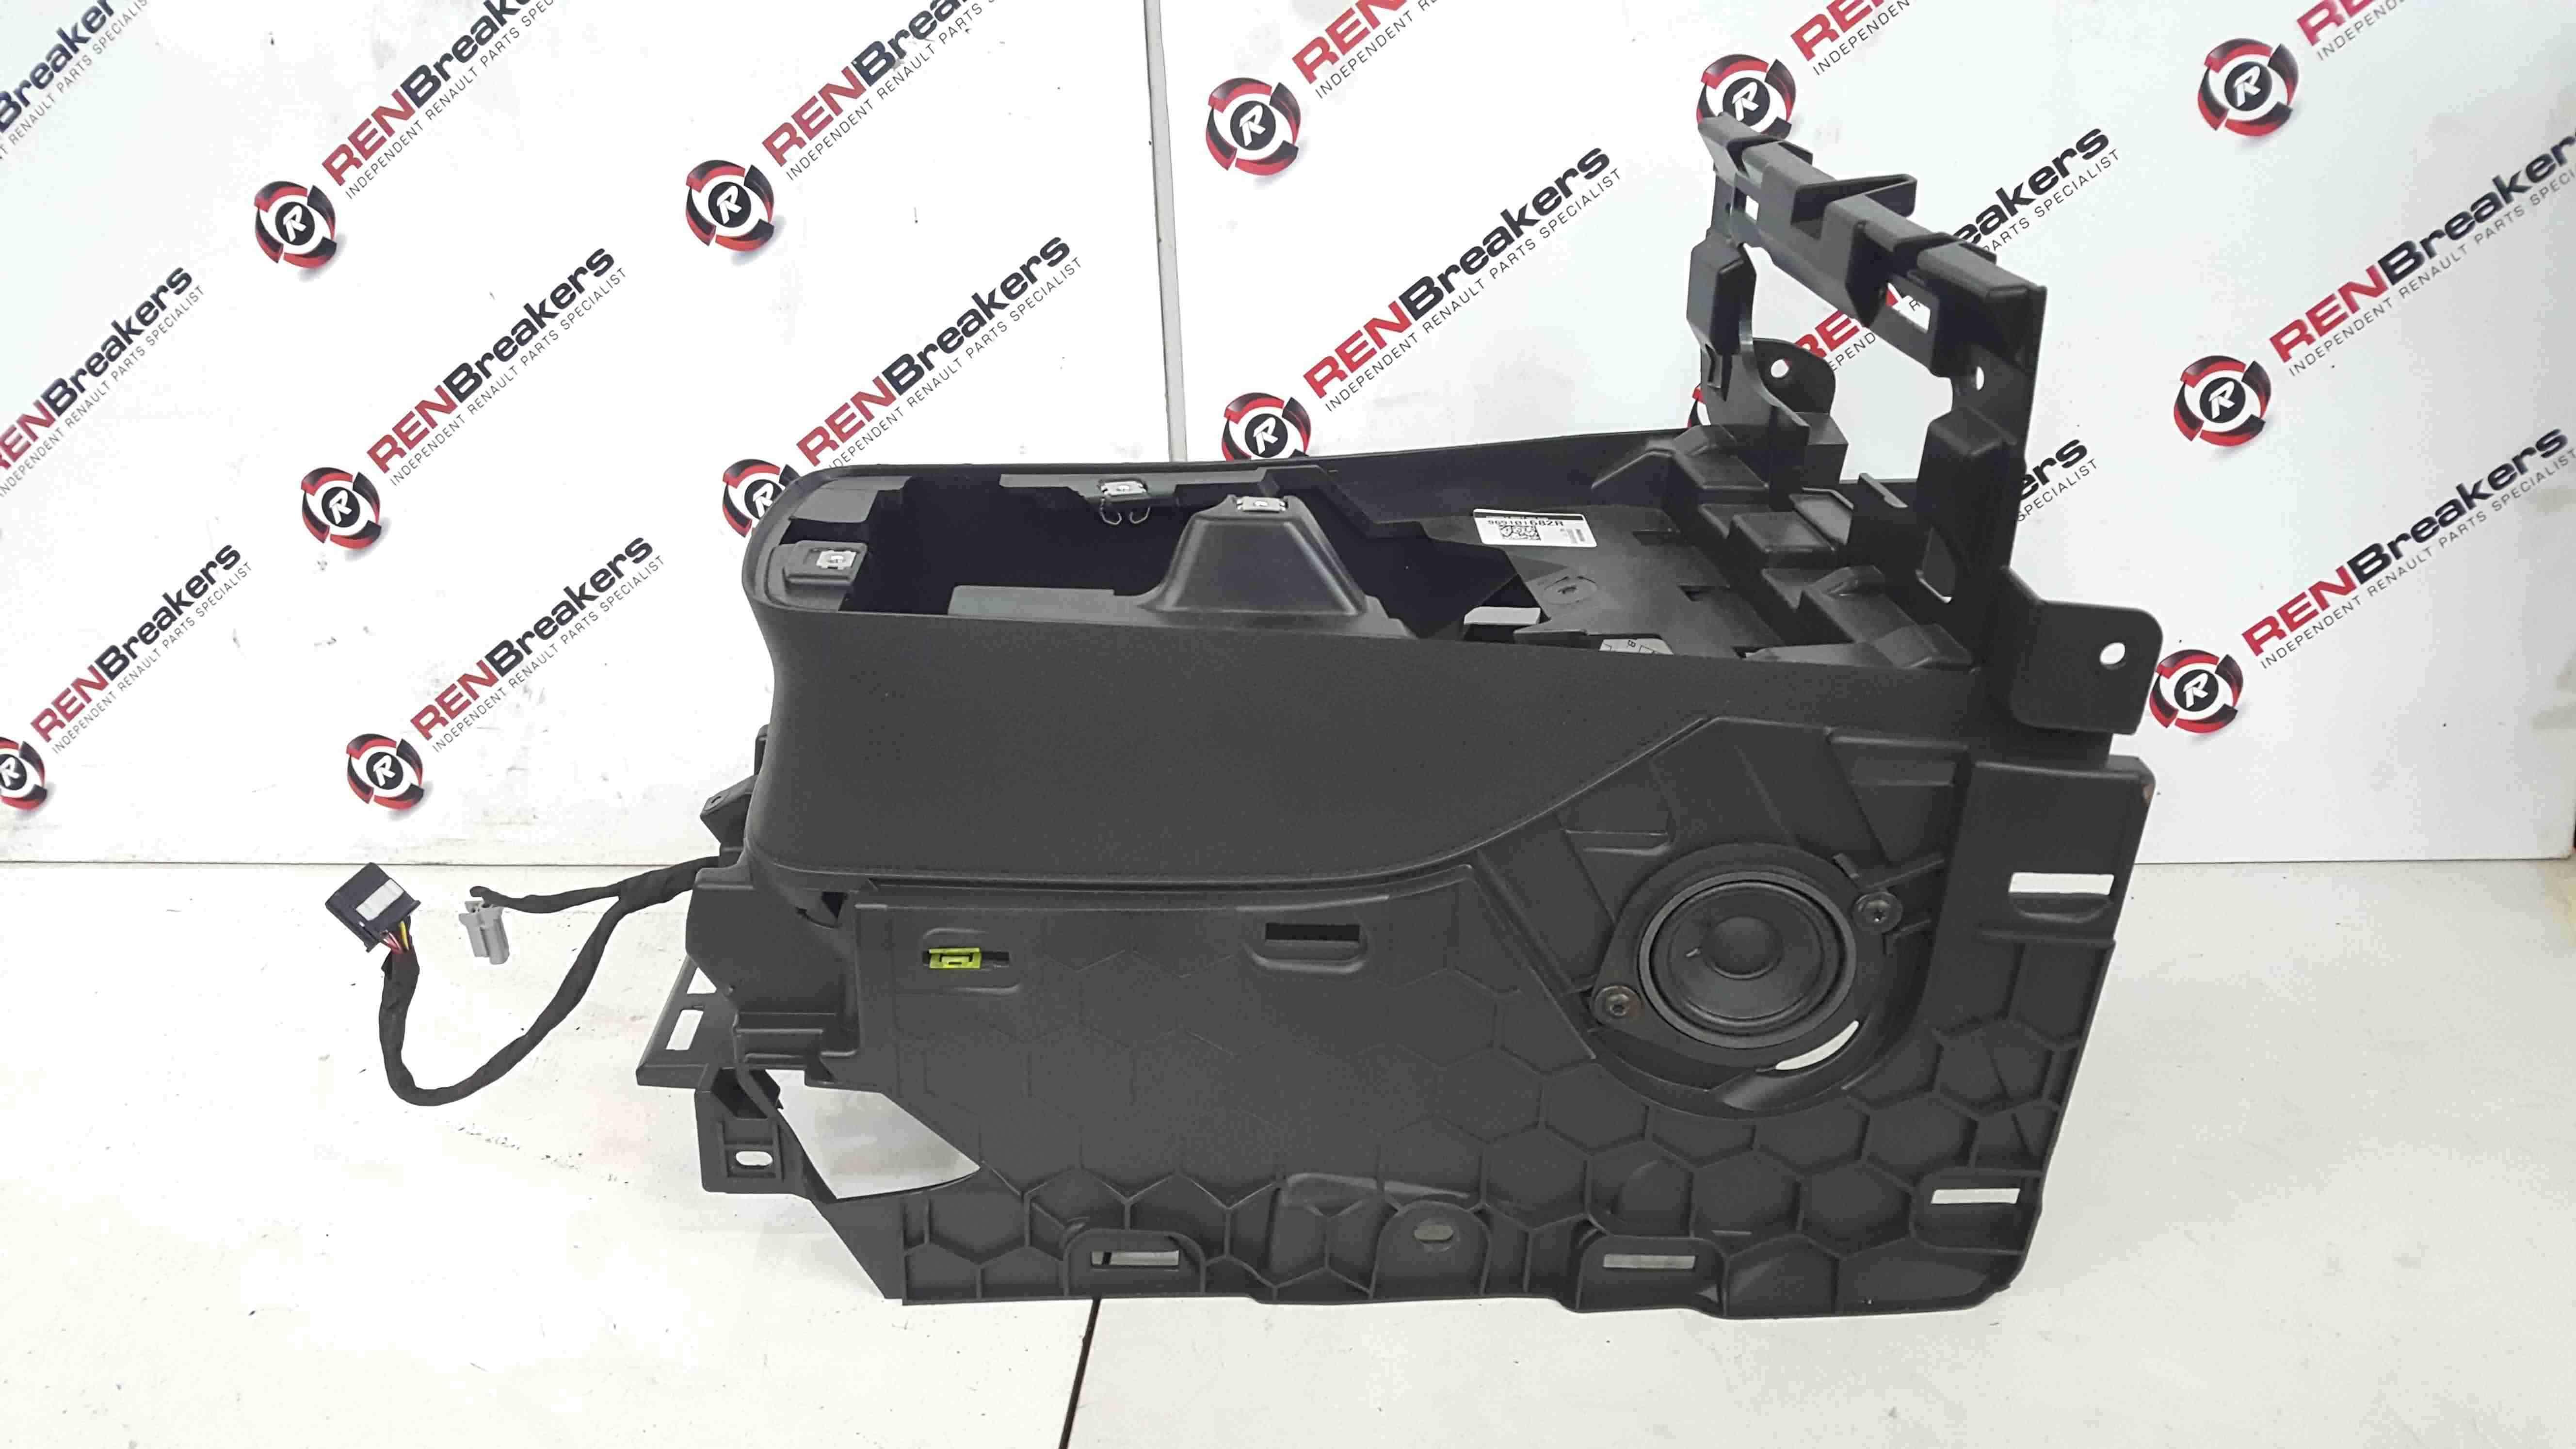 Renault Captur 2019-2021 Centre Console Plastic Surround 969101682R